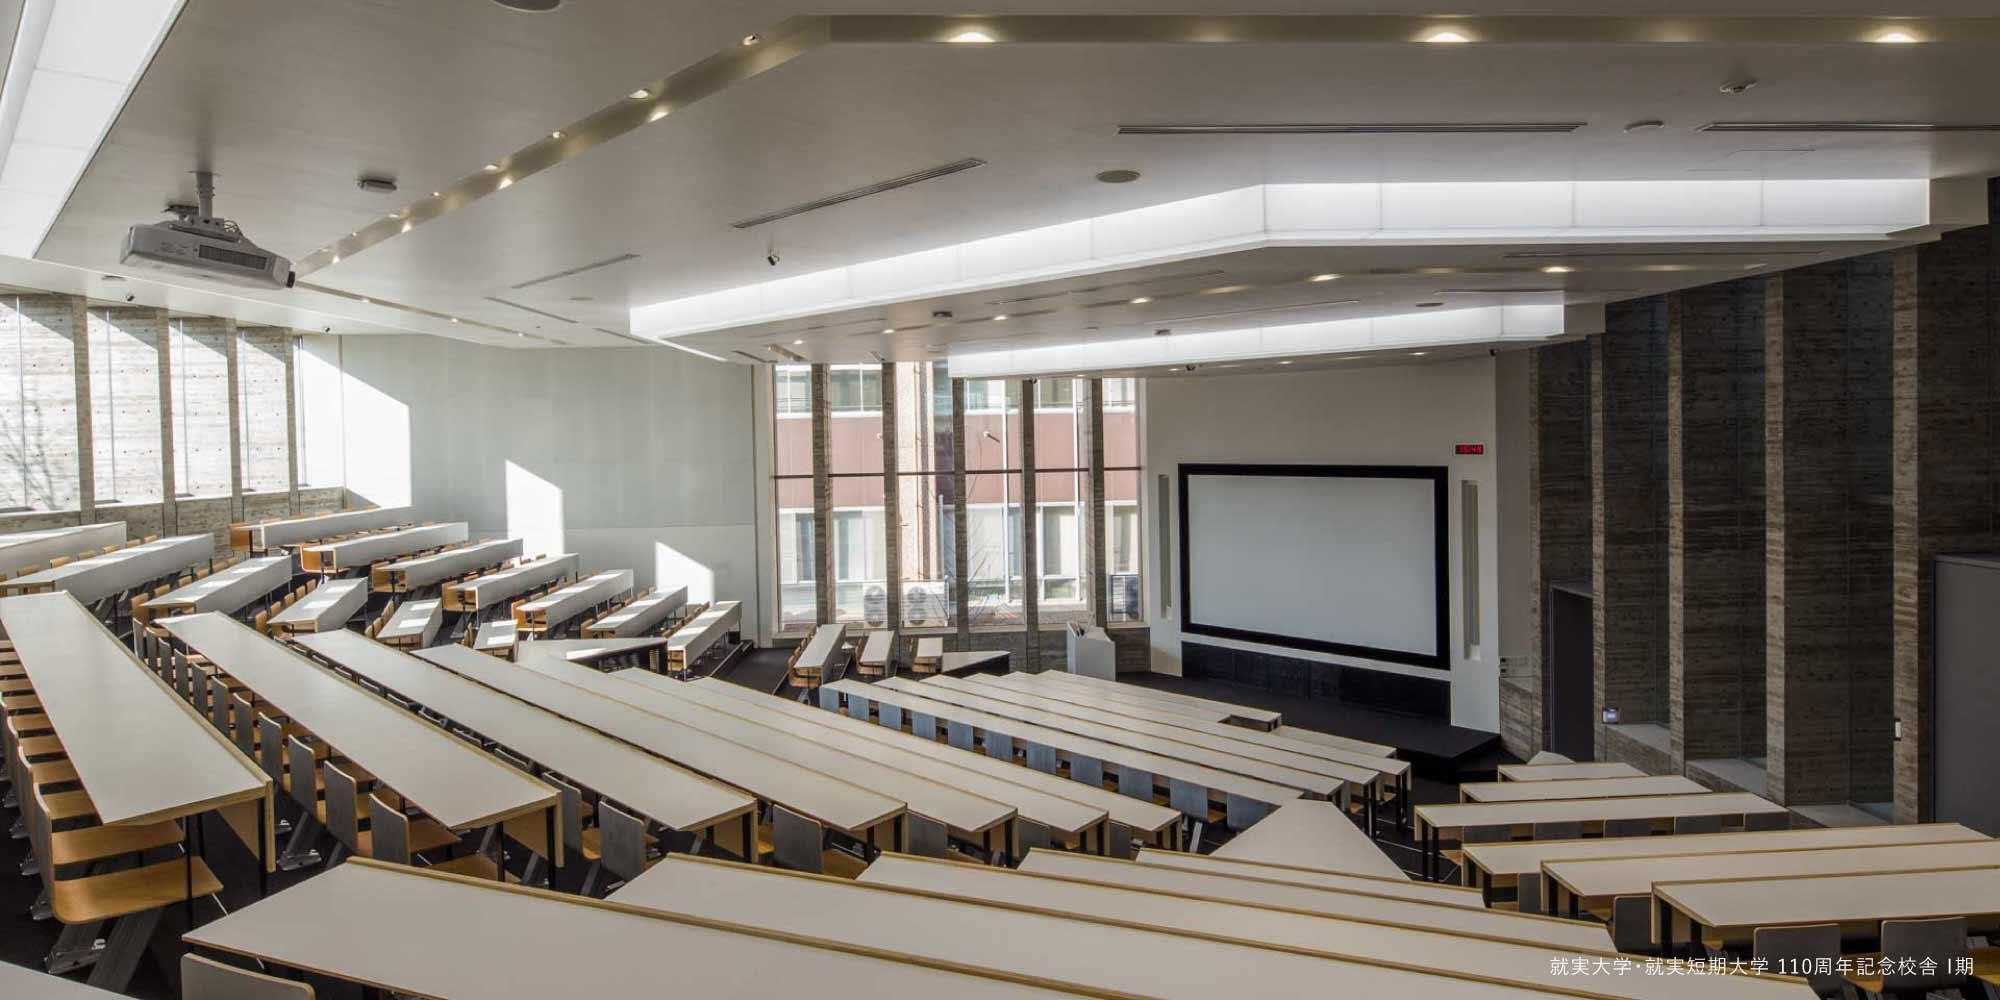 佐藤建築事務所|岡山にあるアトリエ設計事務所。>就実大学・就実短期大学110周年記念校舎1期 、設計、改修